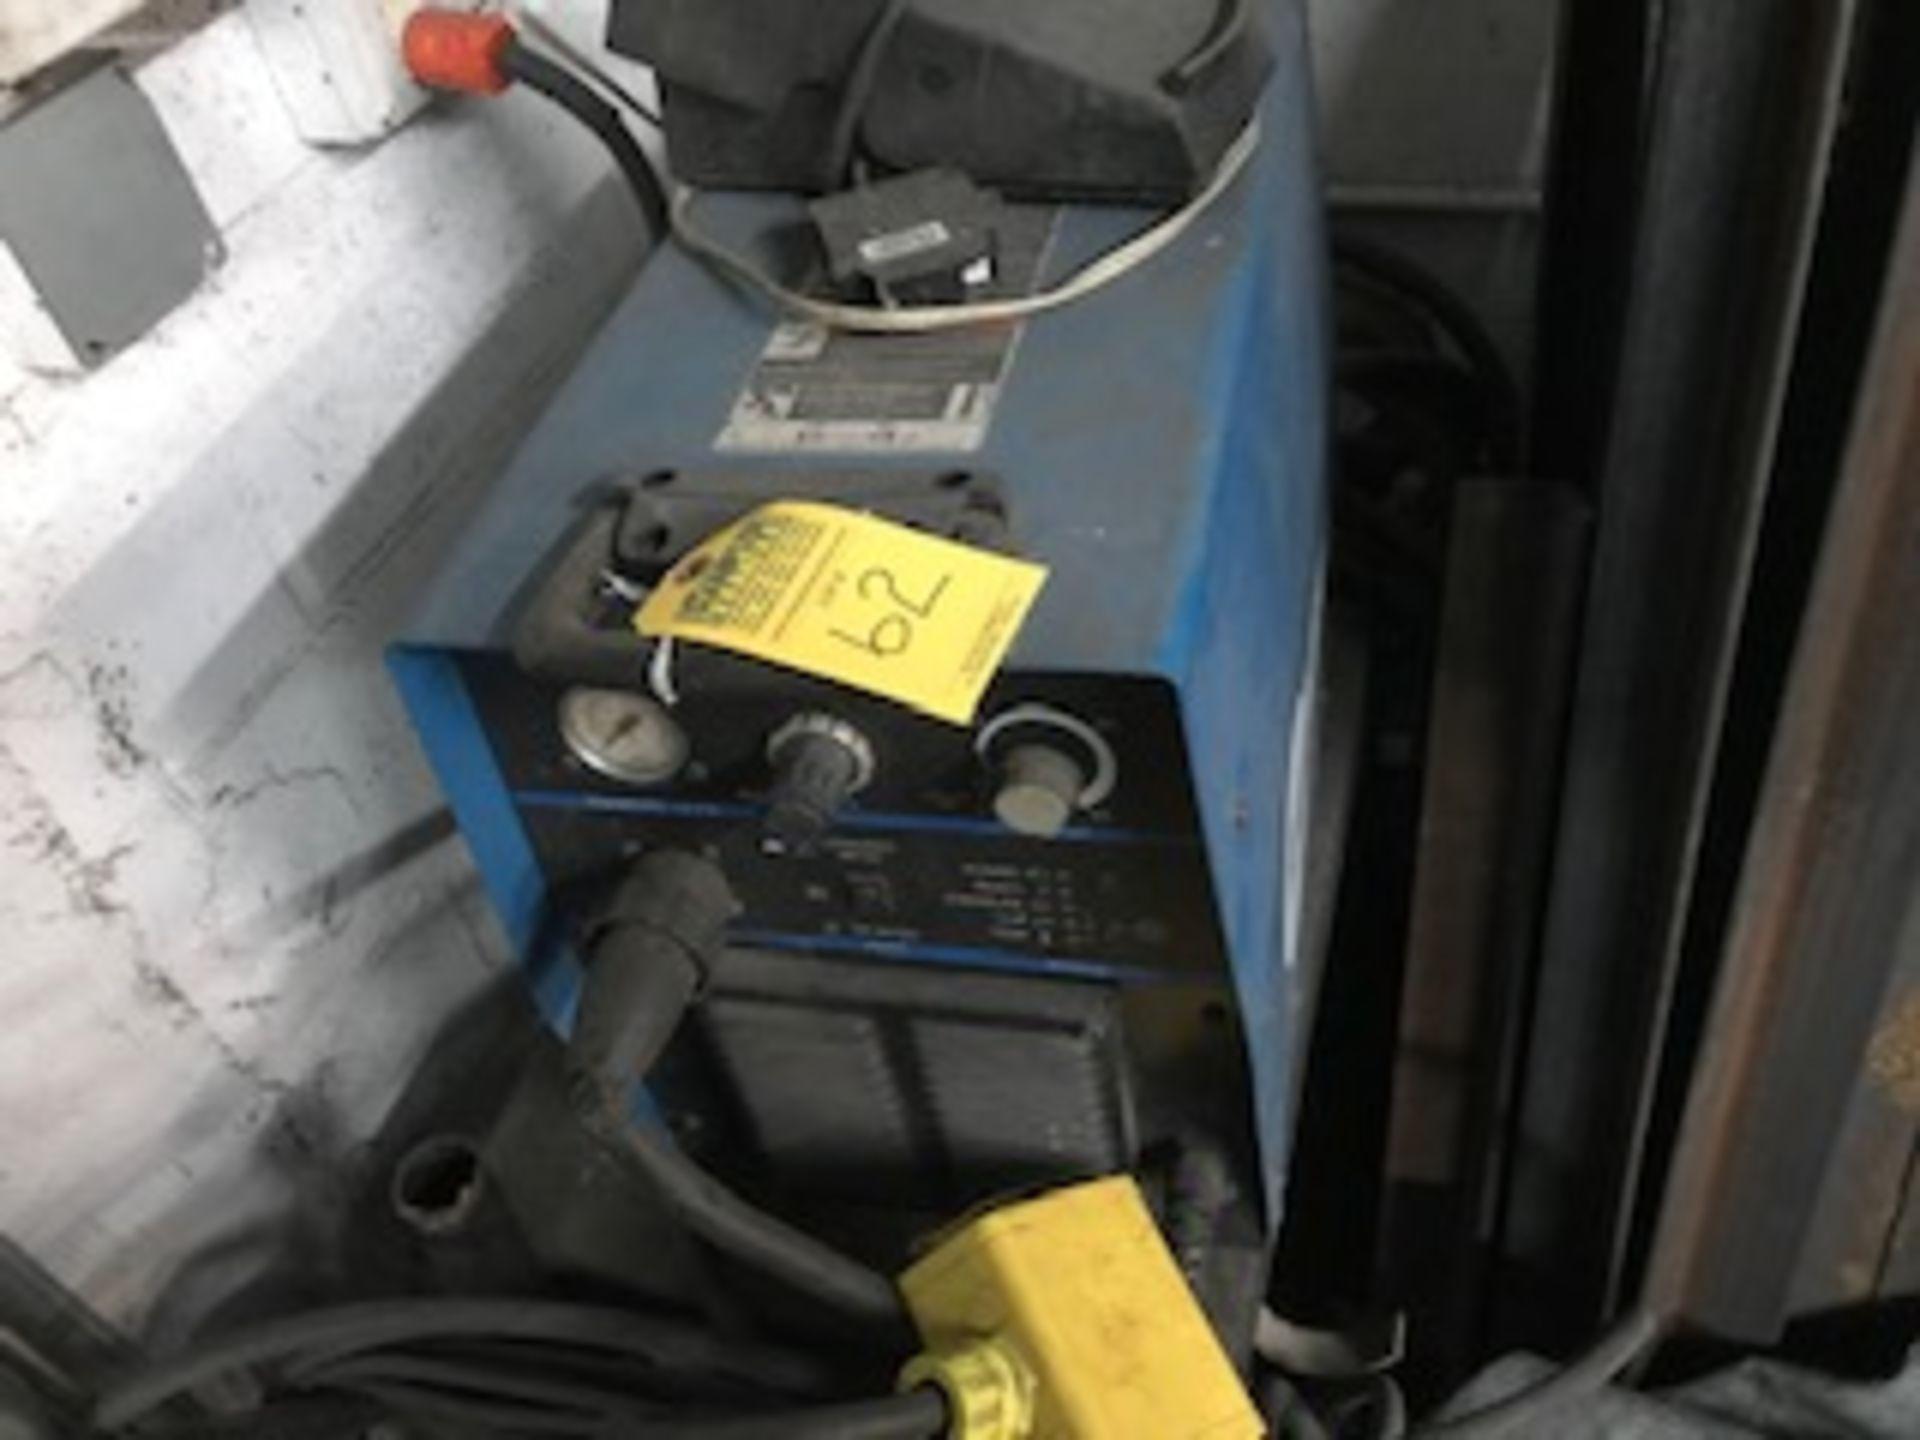 Lot 62 - MILLER SPECTRUM 205DC PLASMA CUTTING SYSTEM WITH AUTO LINE